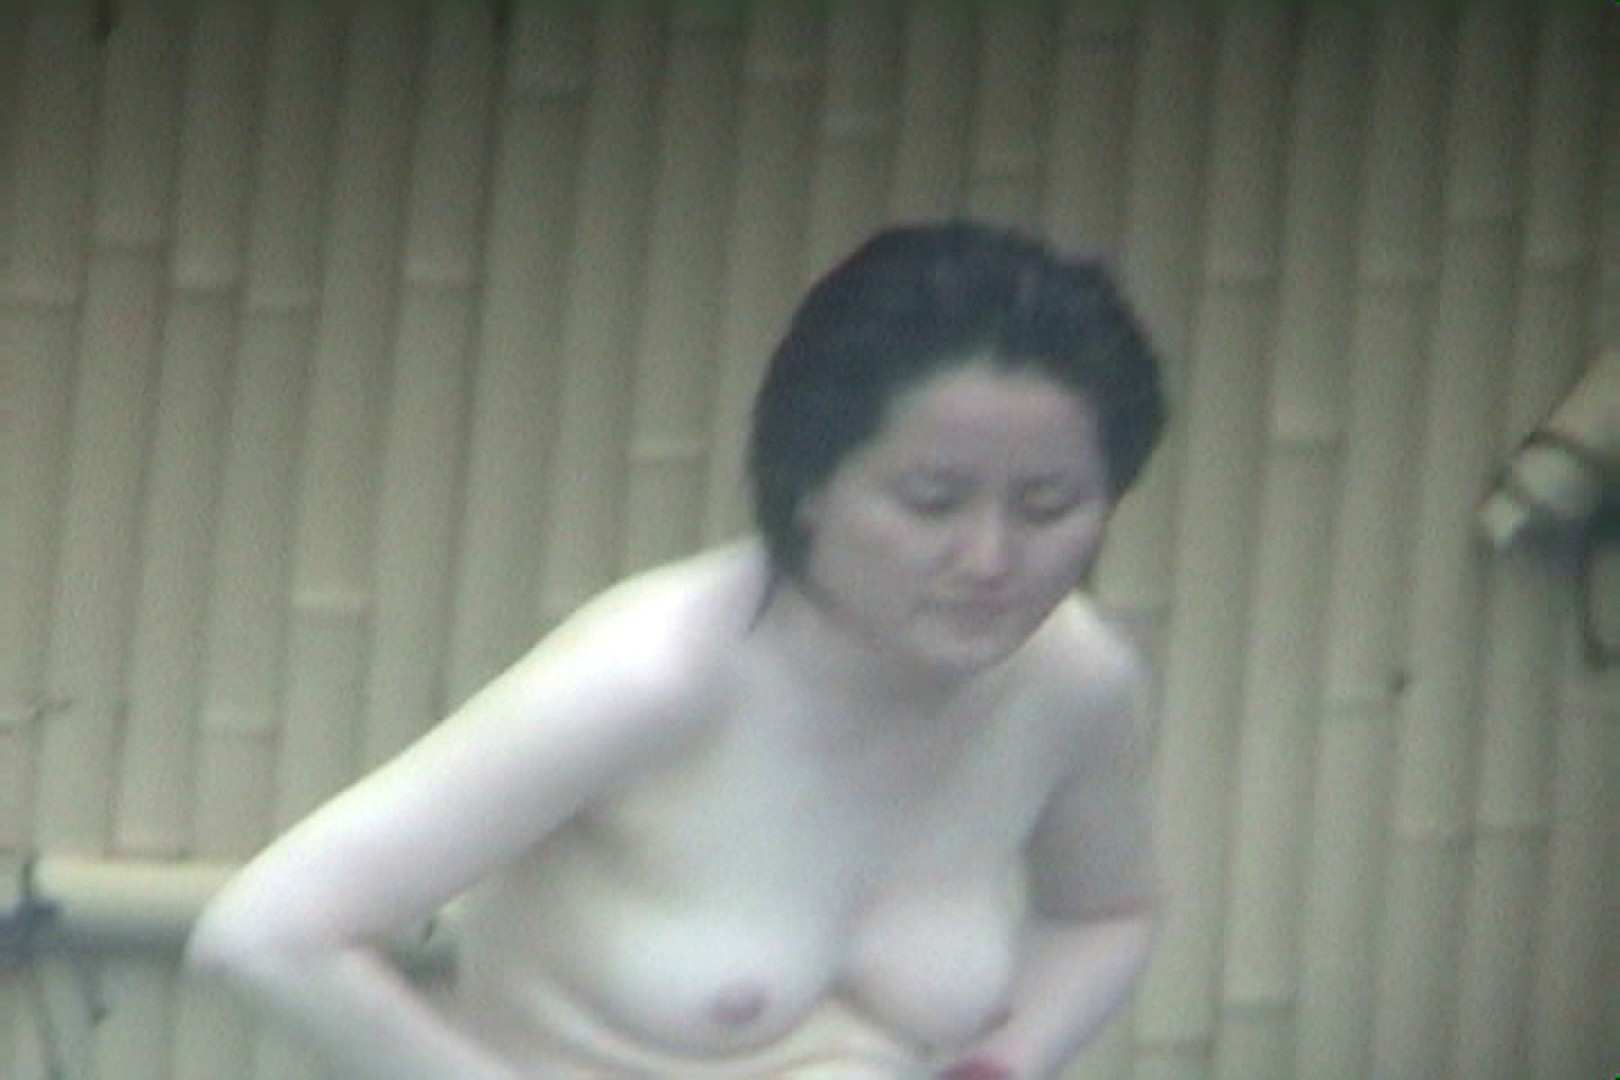 Aquaな露天風呂Vol.107 露天風呂 | OLのエロ生活  51連発 28